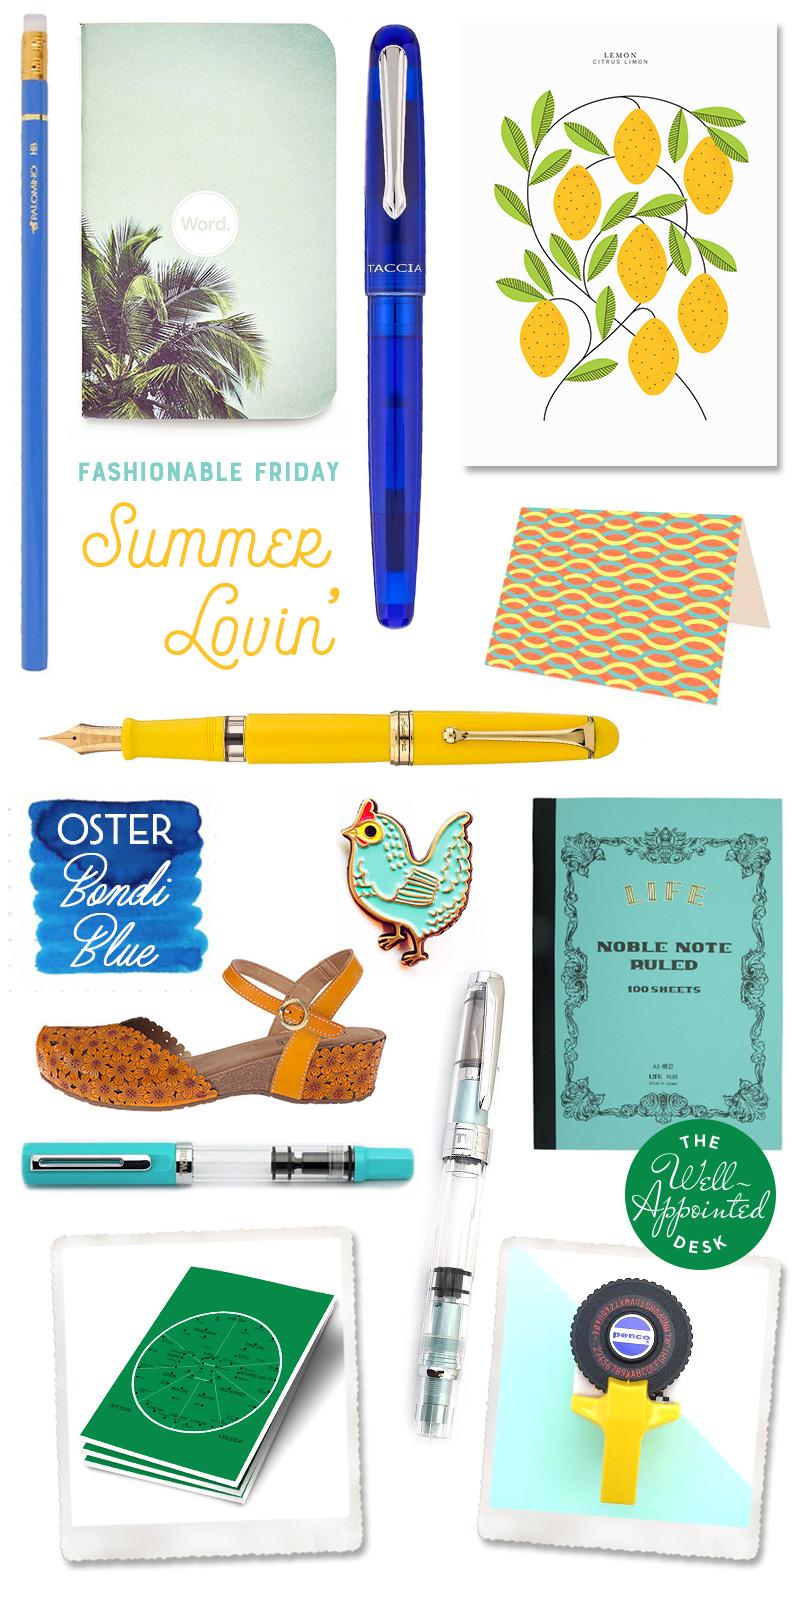 Fashionable Friday: Summer Lovin'